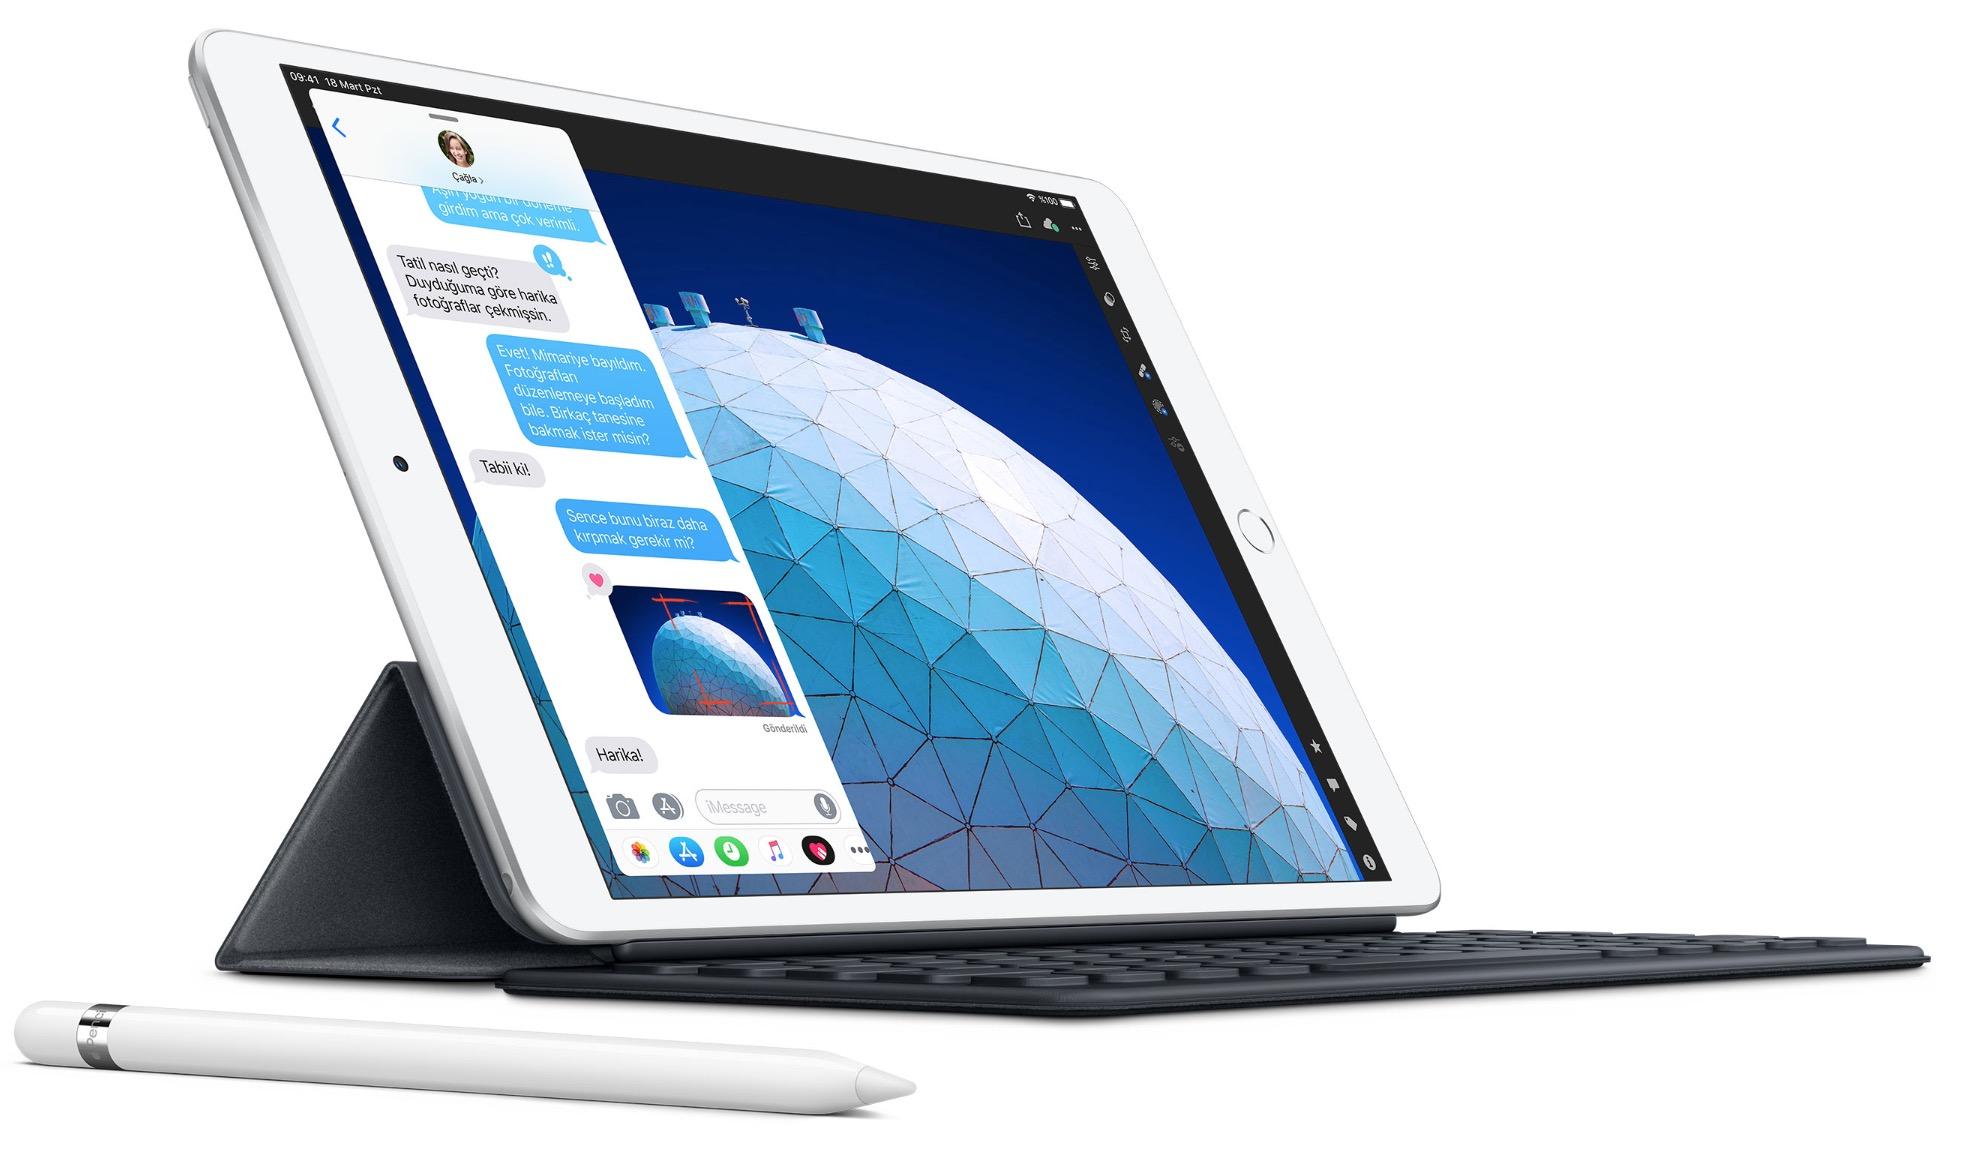 iPad Air 2019 Geekbench-en puntuek harrituta